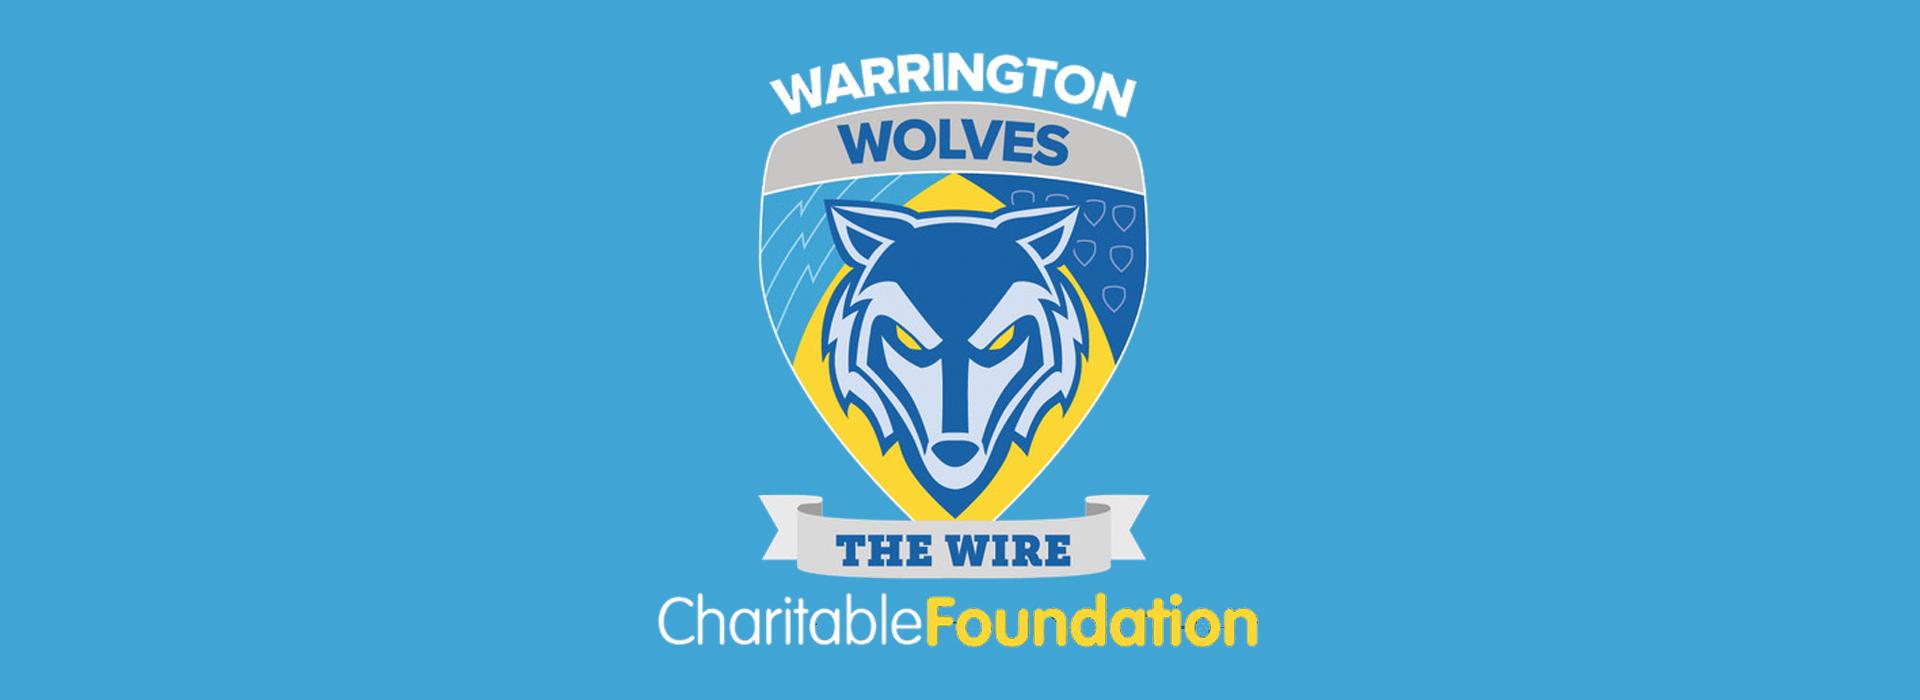 Warrington Wolves Charitable Foundation